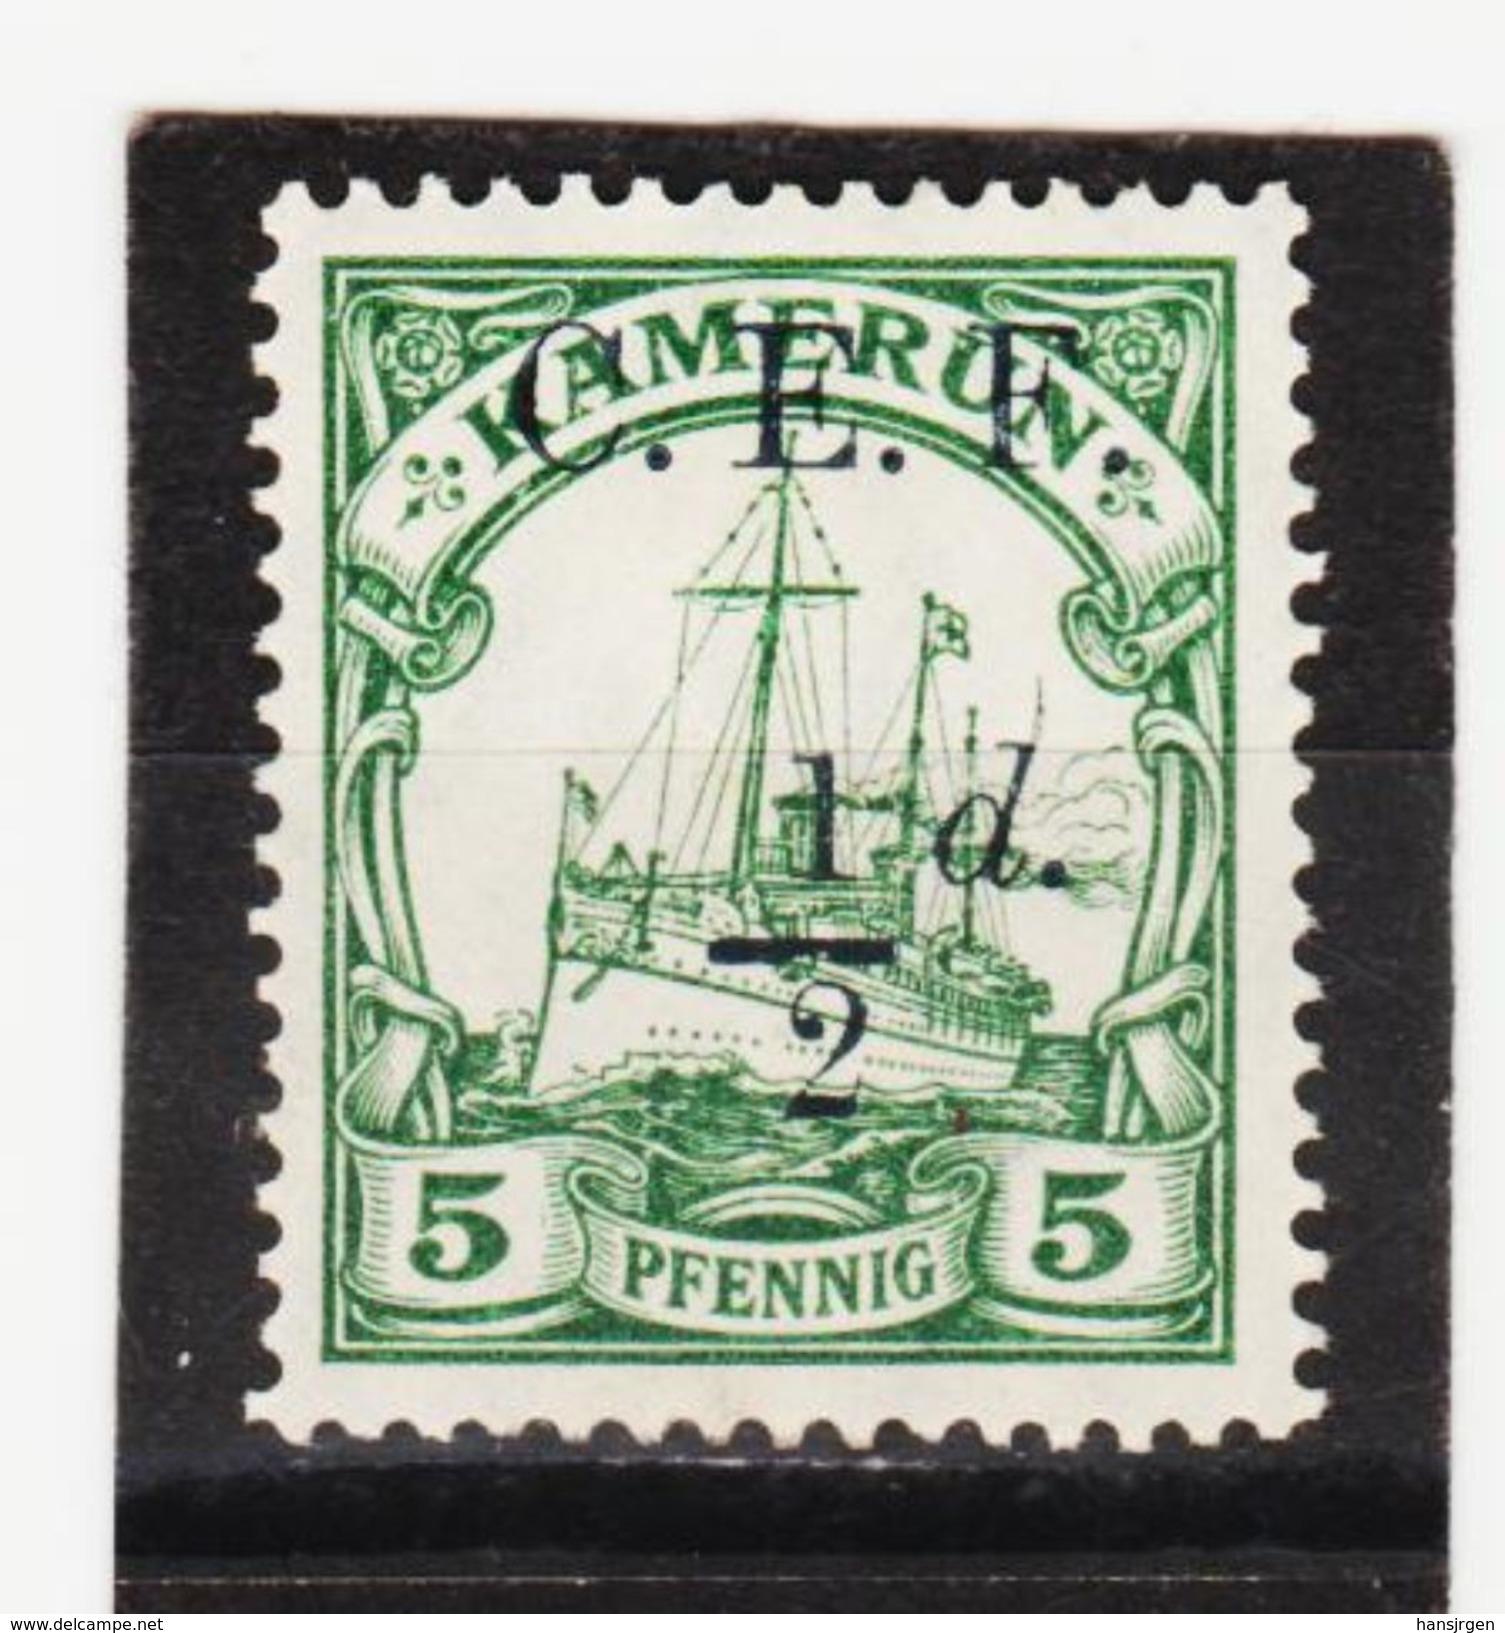 ÖMV1606 KAMERUN 1915  MICHL  2  BRITISCHE BESETZUNG ** Postfrisch  SIEHE ABBILDUNG - Kolonie: Kamerun